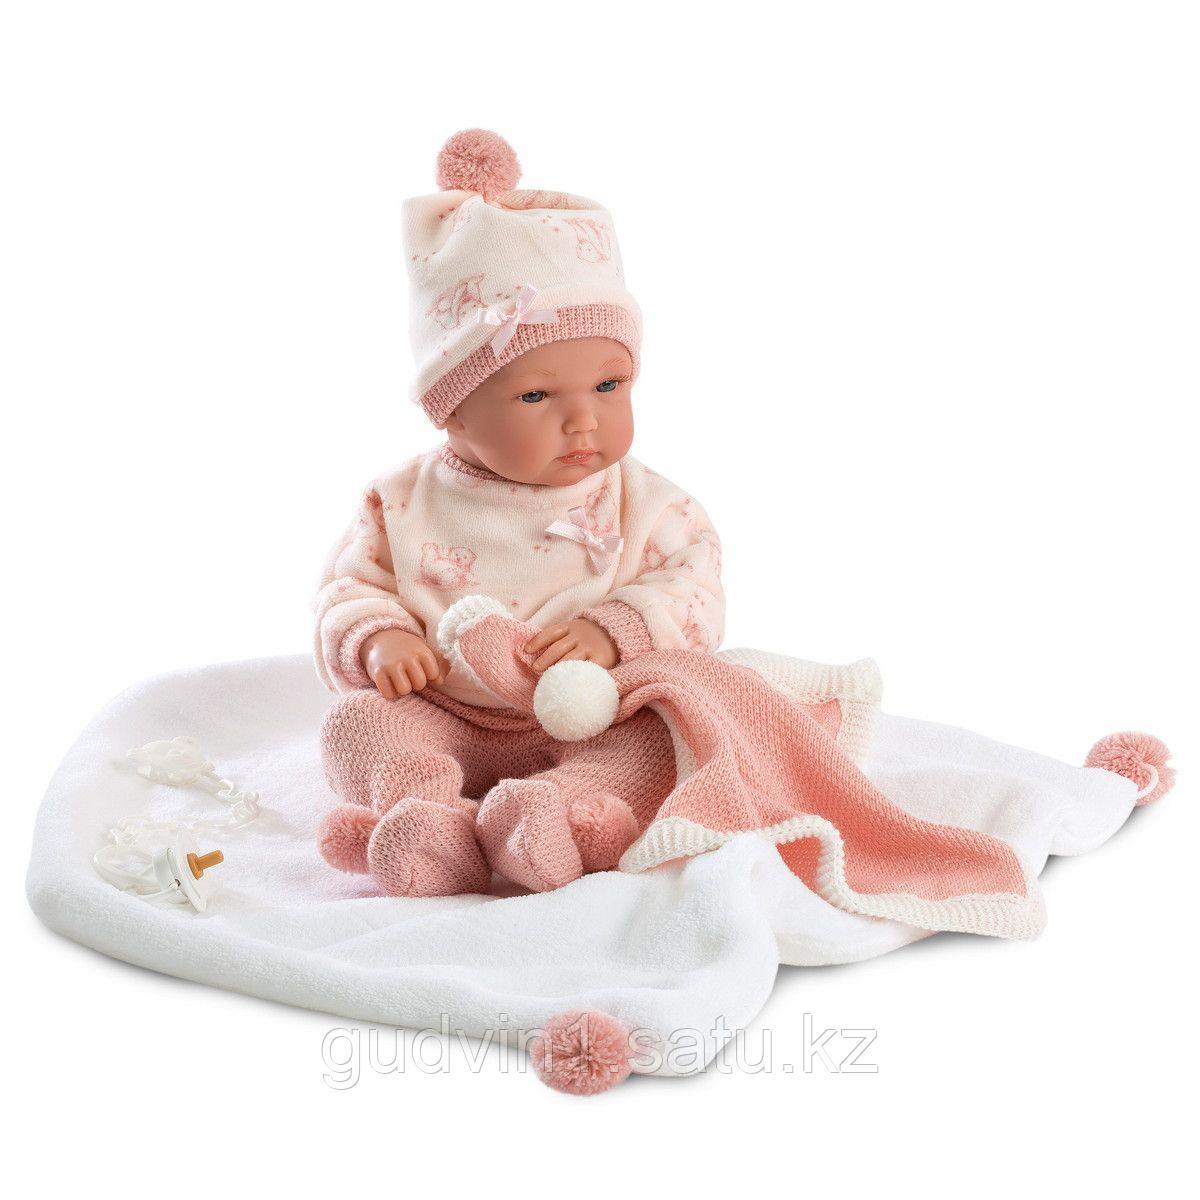 LLORENS: Кукла малышка 35 см в роз.шапочке с пумпоном с одеялом 63546